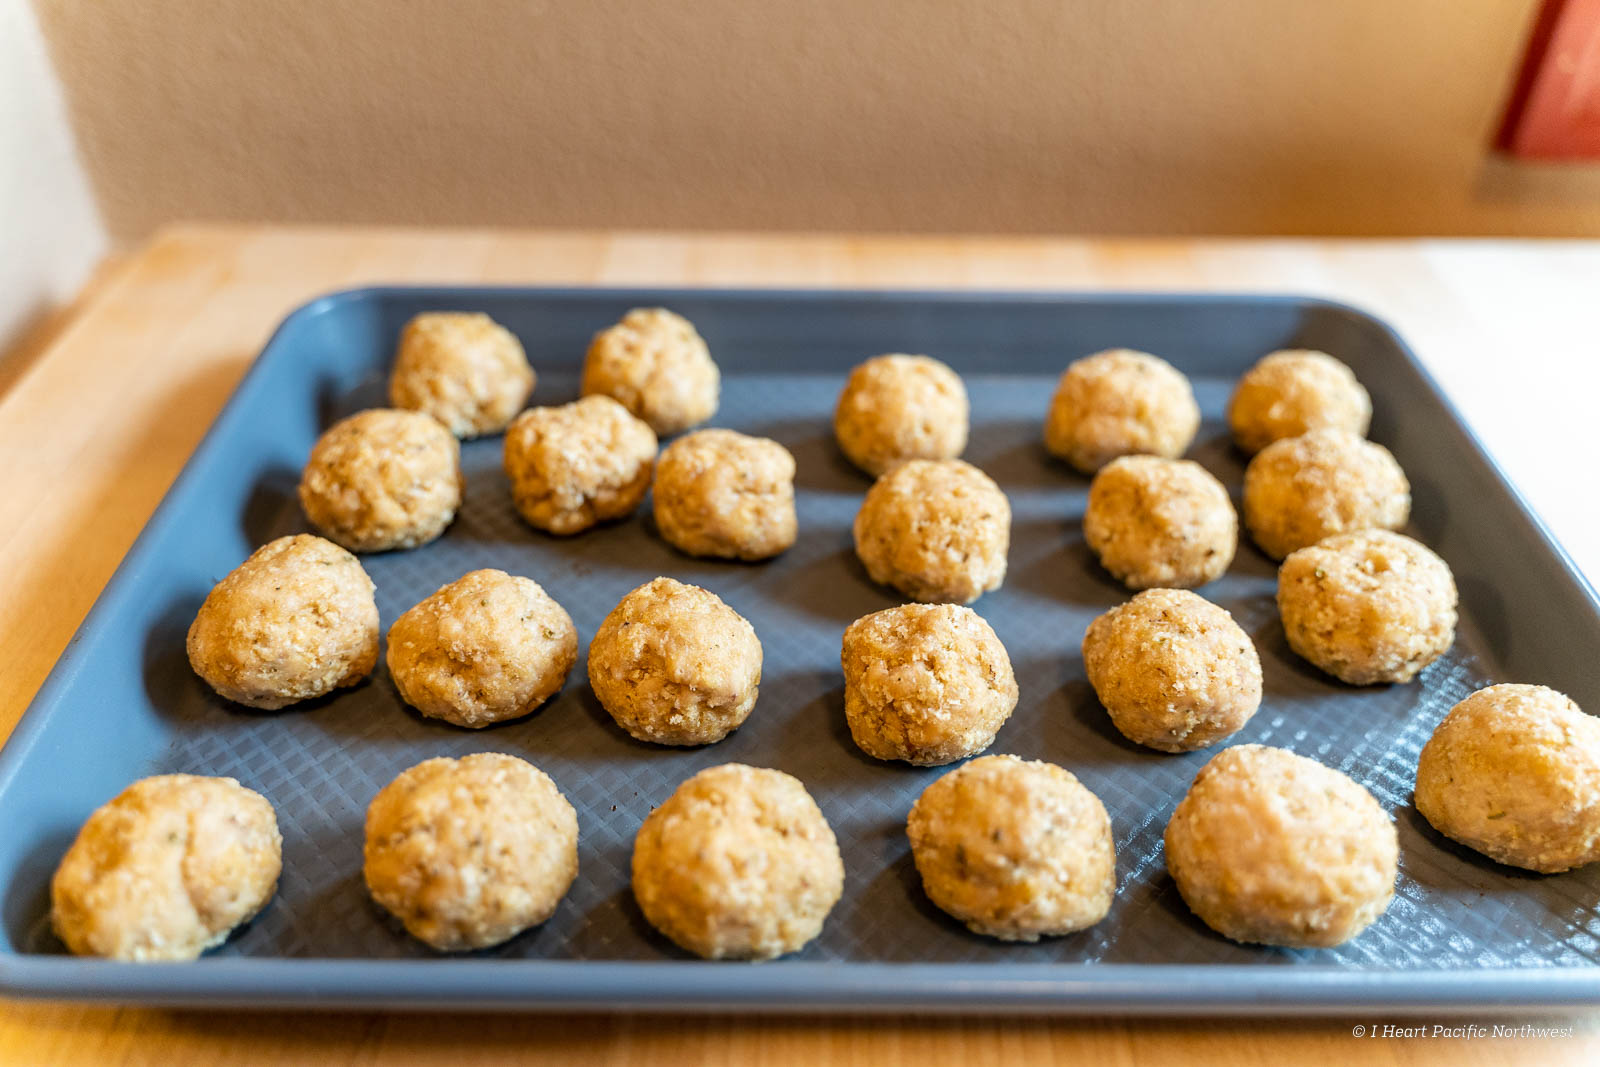 backpacking recipe - chicken meatballs